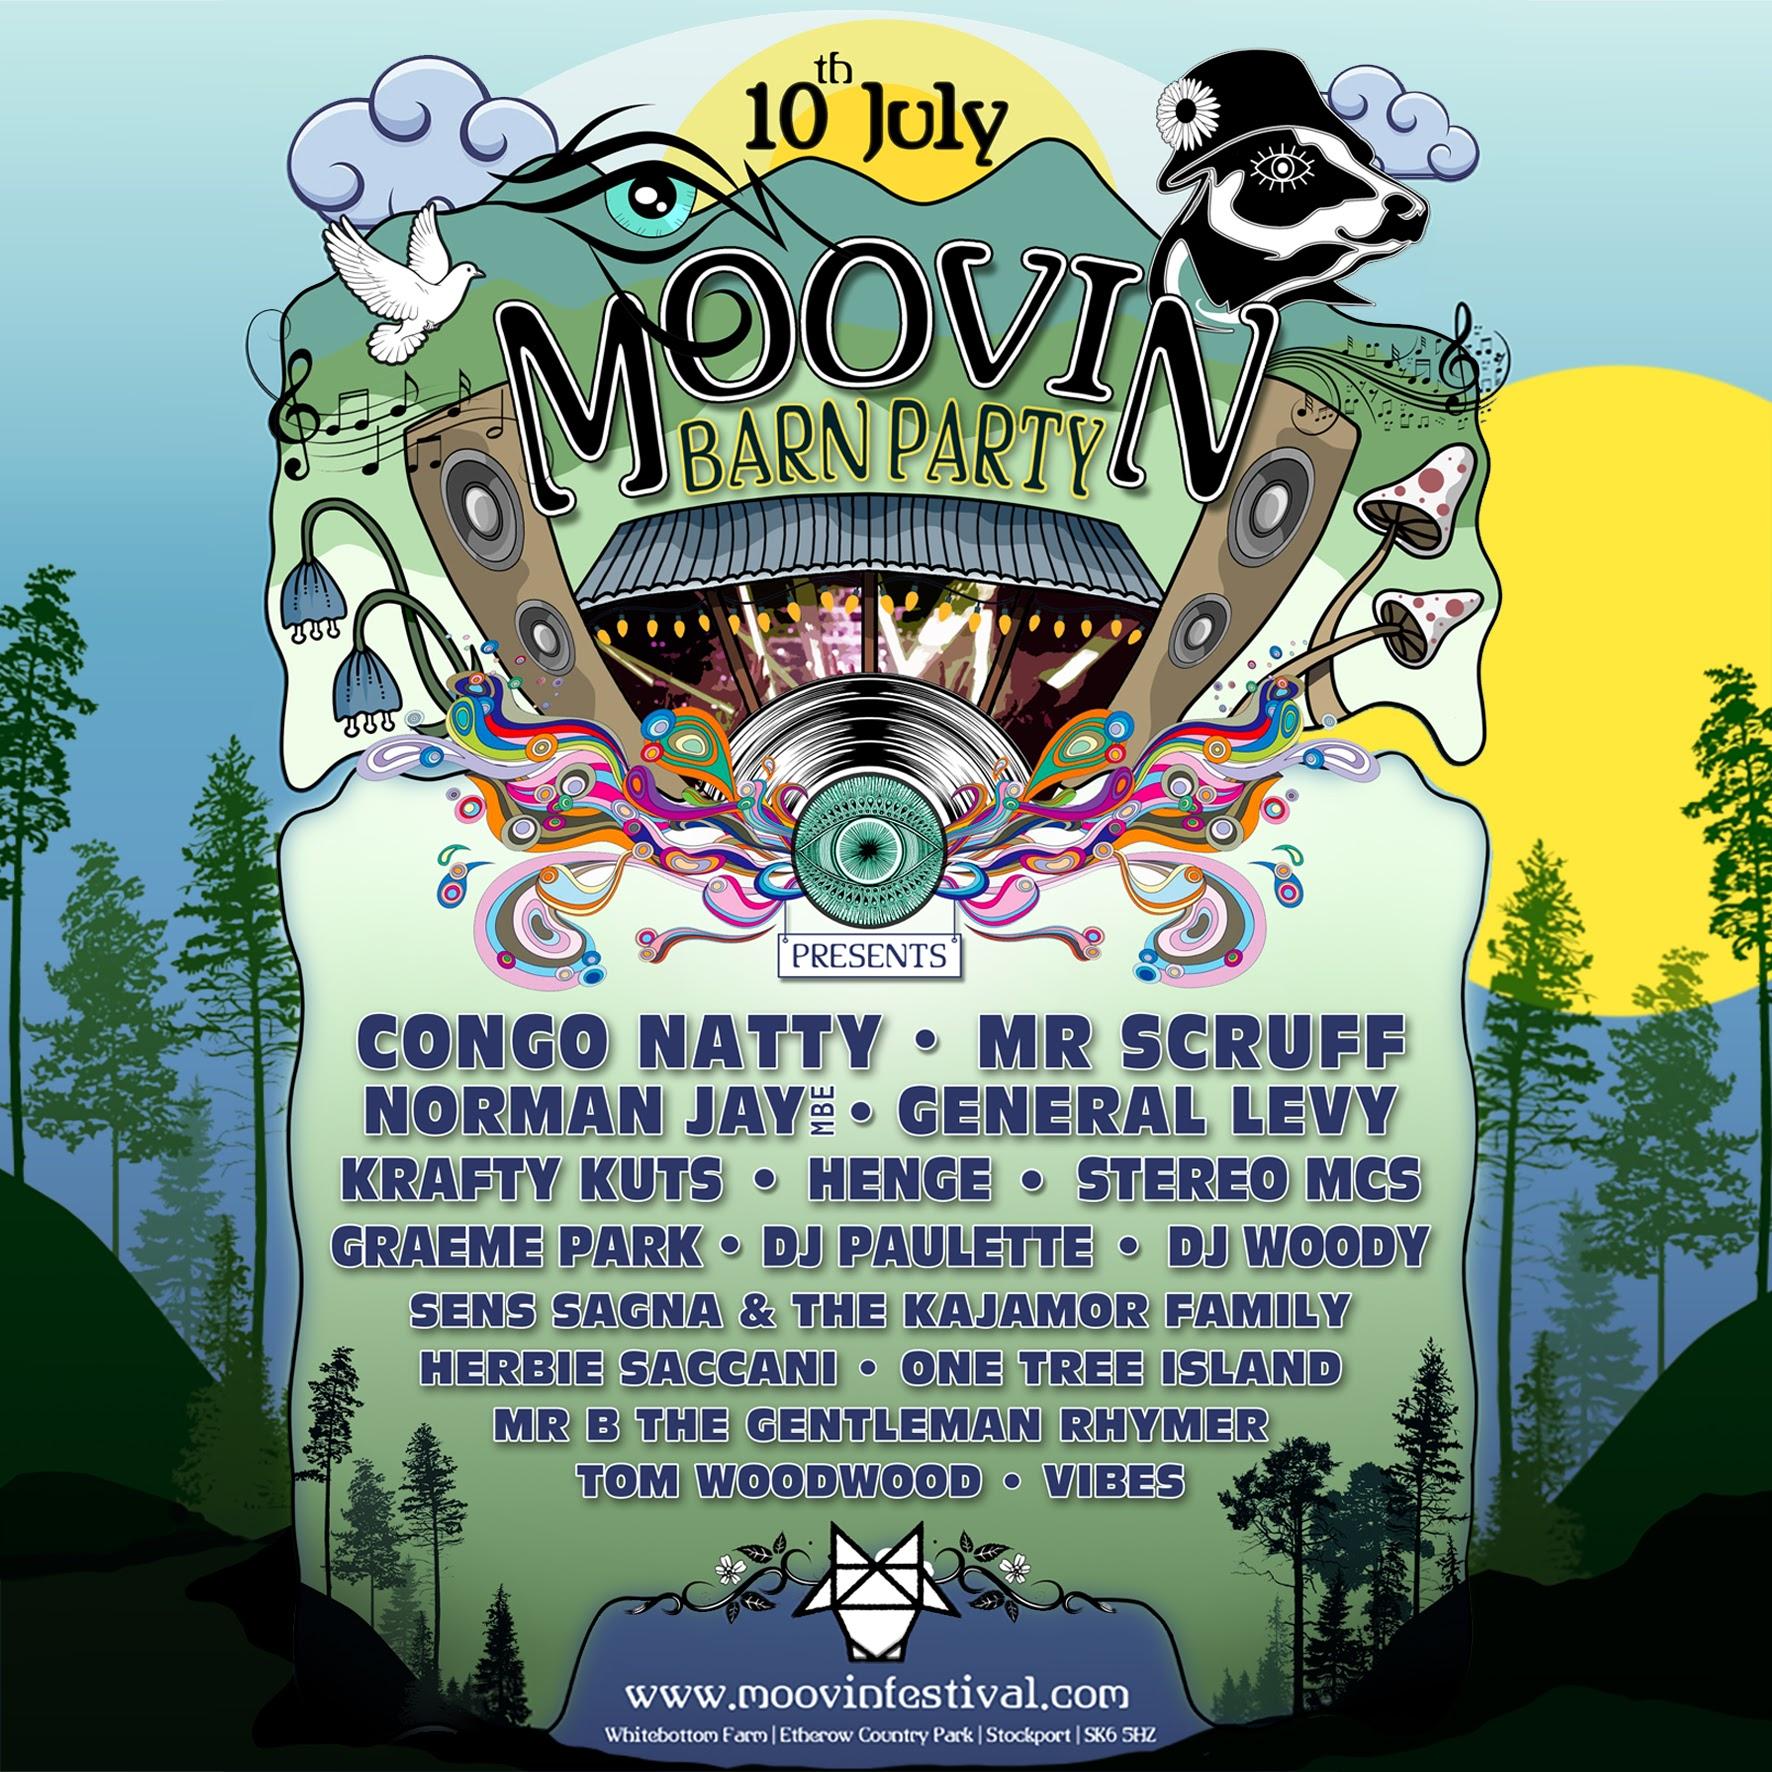 Moovin Festival announce 12-hour barn party with Congo Natty & Mr Scruff